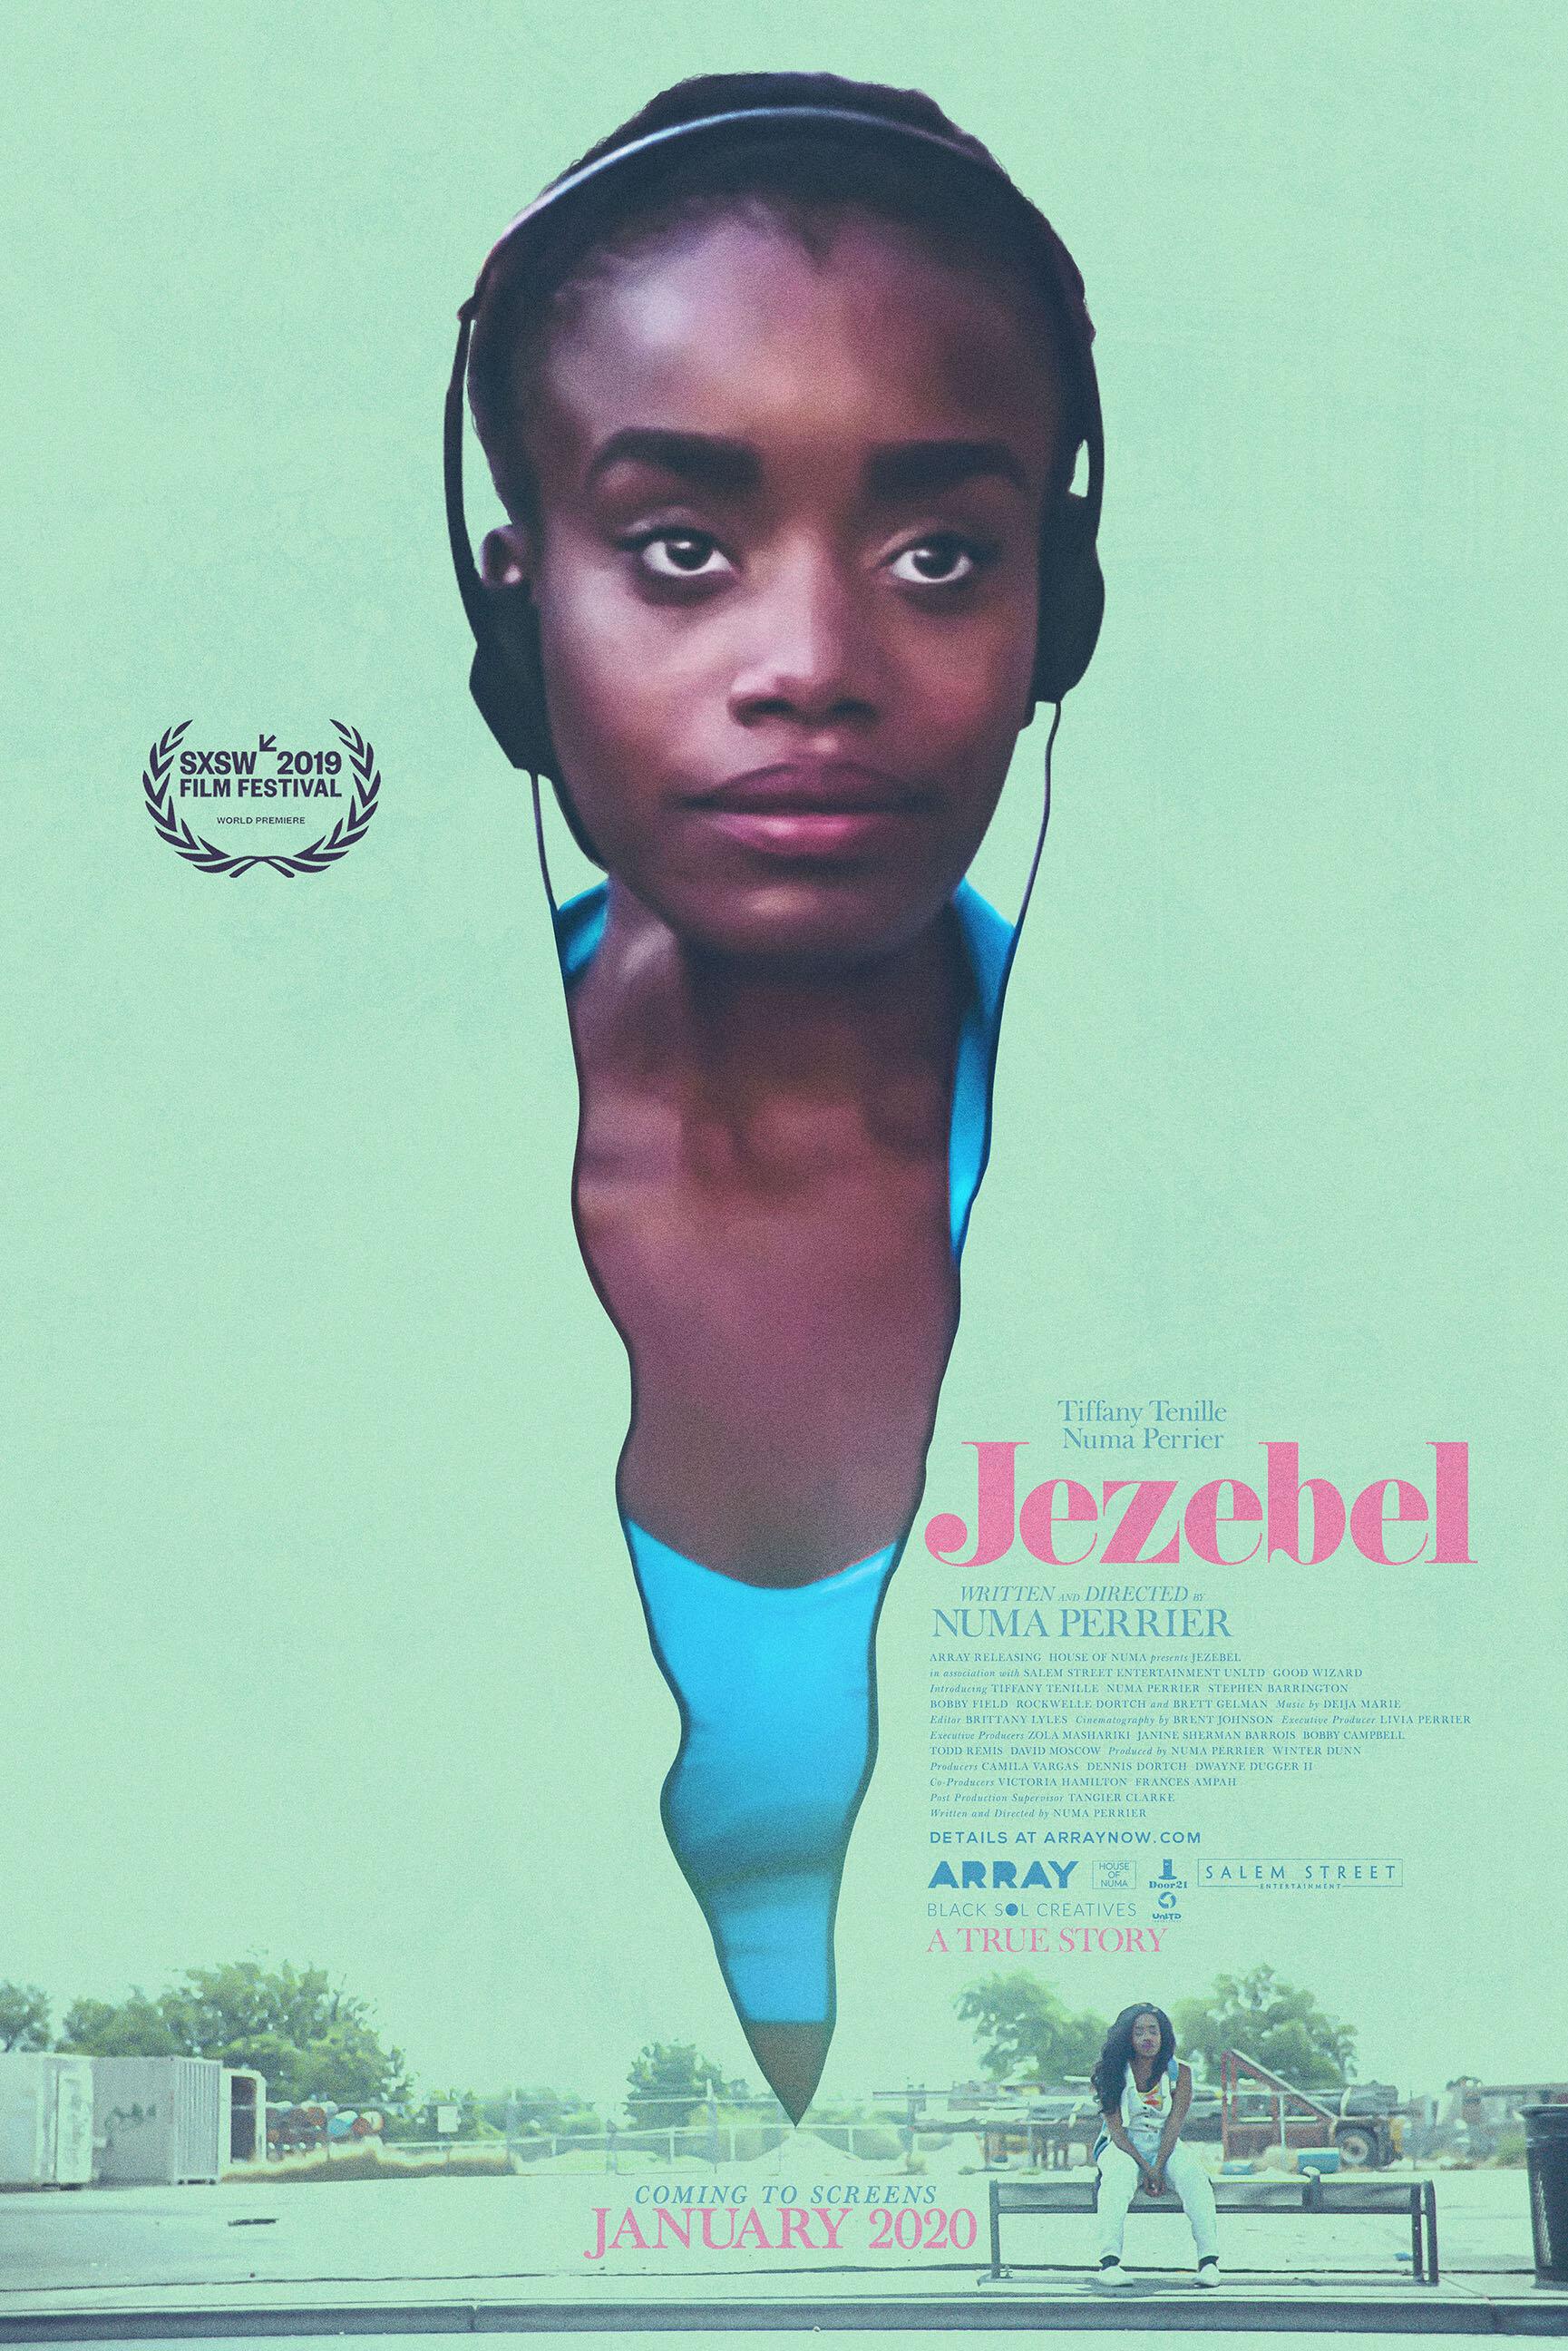 JEZEBEL FILM